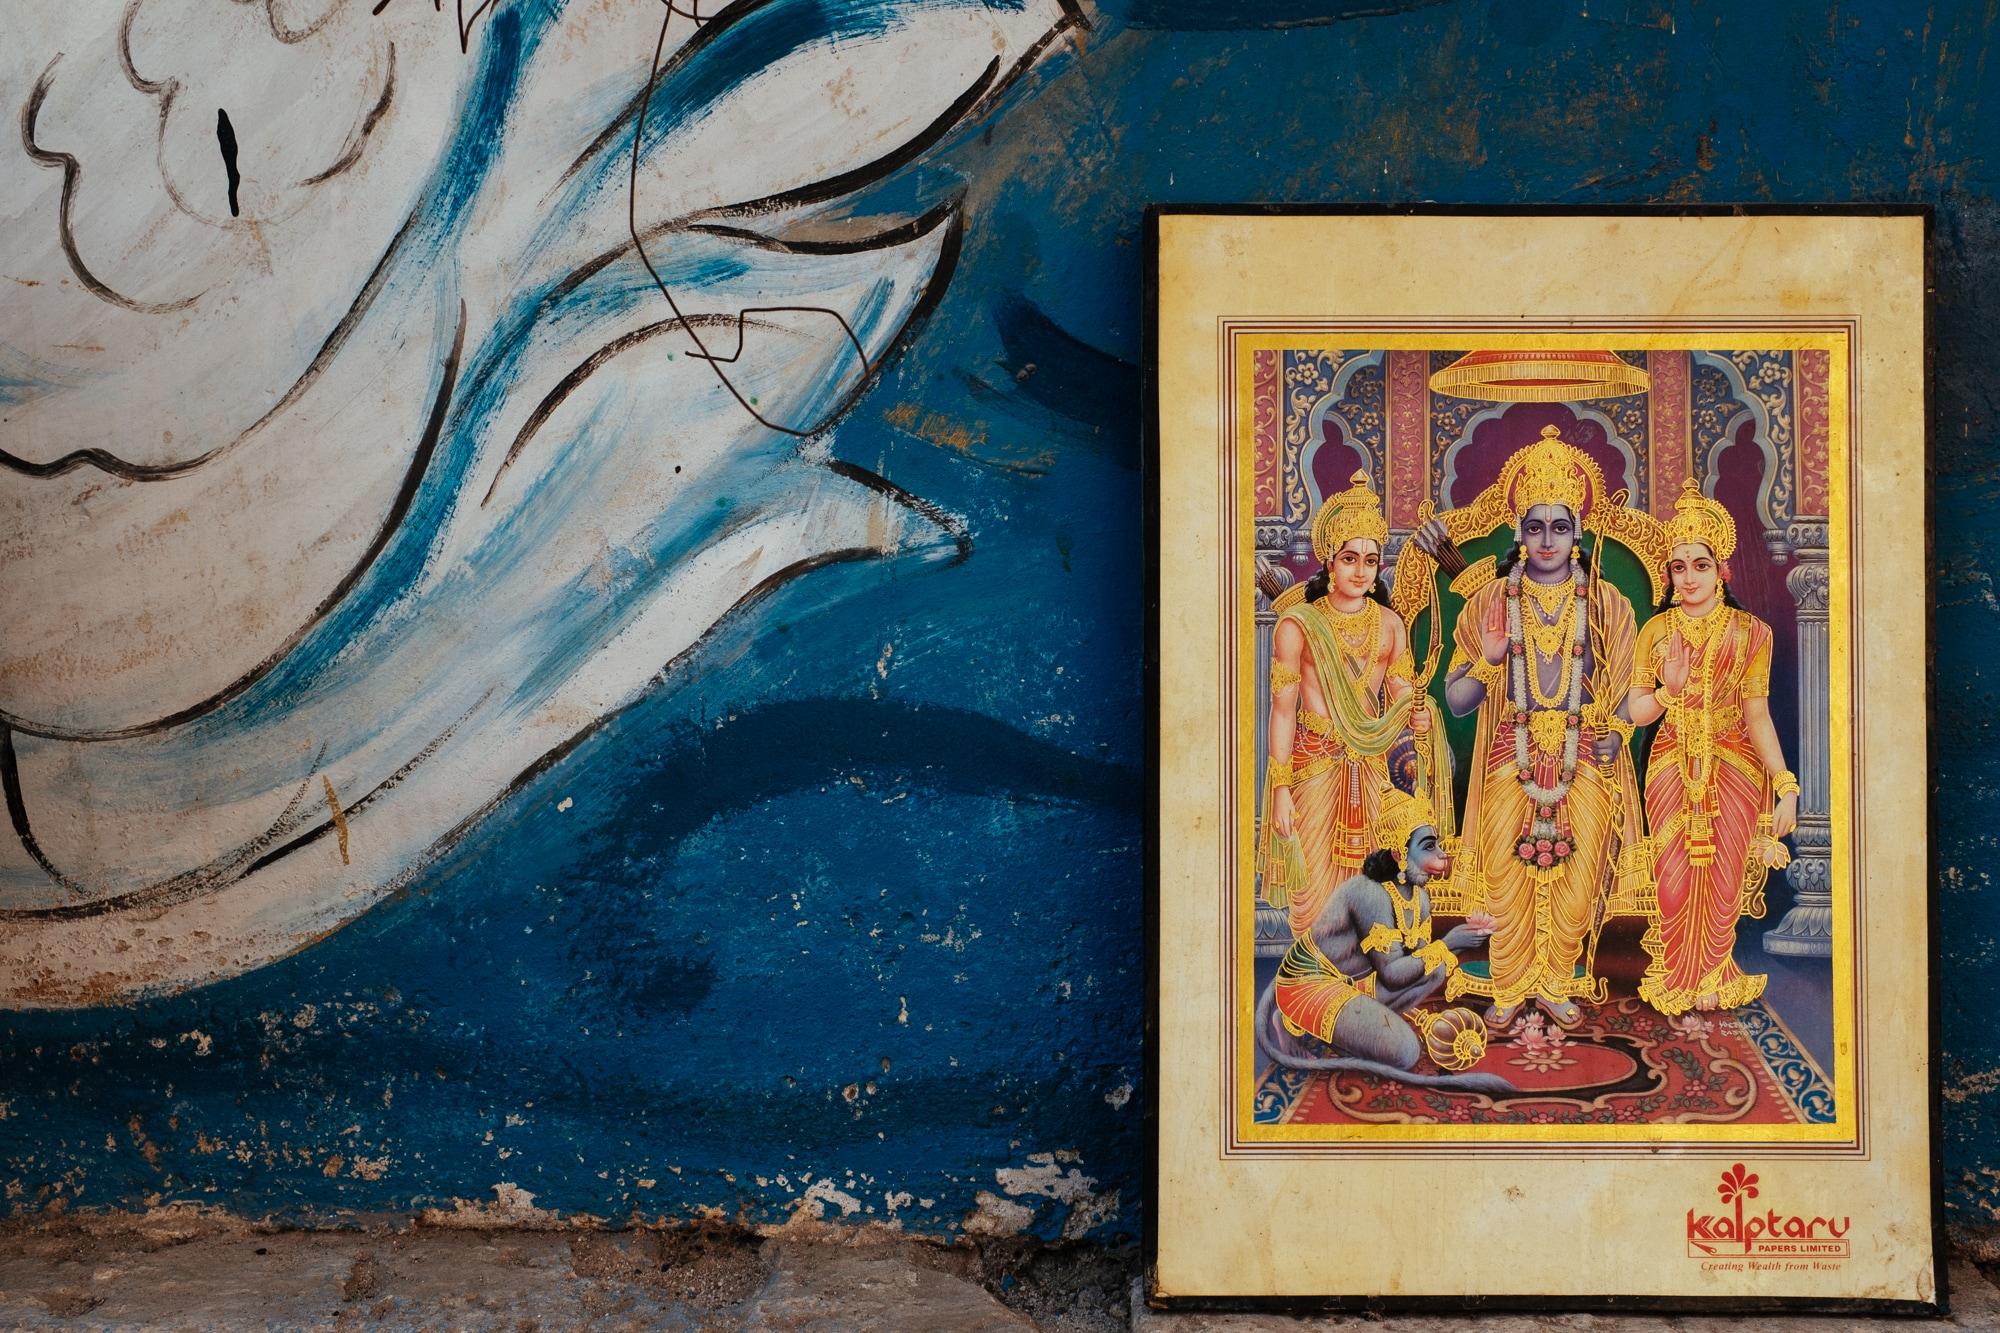 An illustration of Hindu deities Lord Rama, his wife Sita, his brother Lakshmana, and Lord Hanumana.